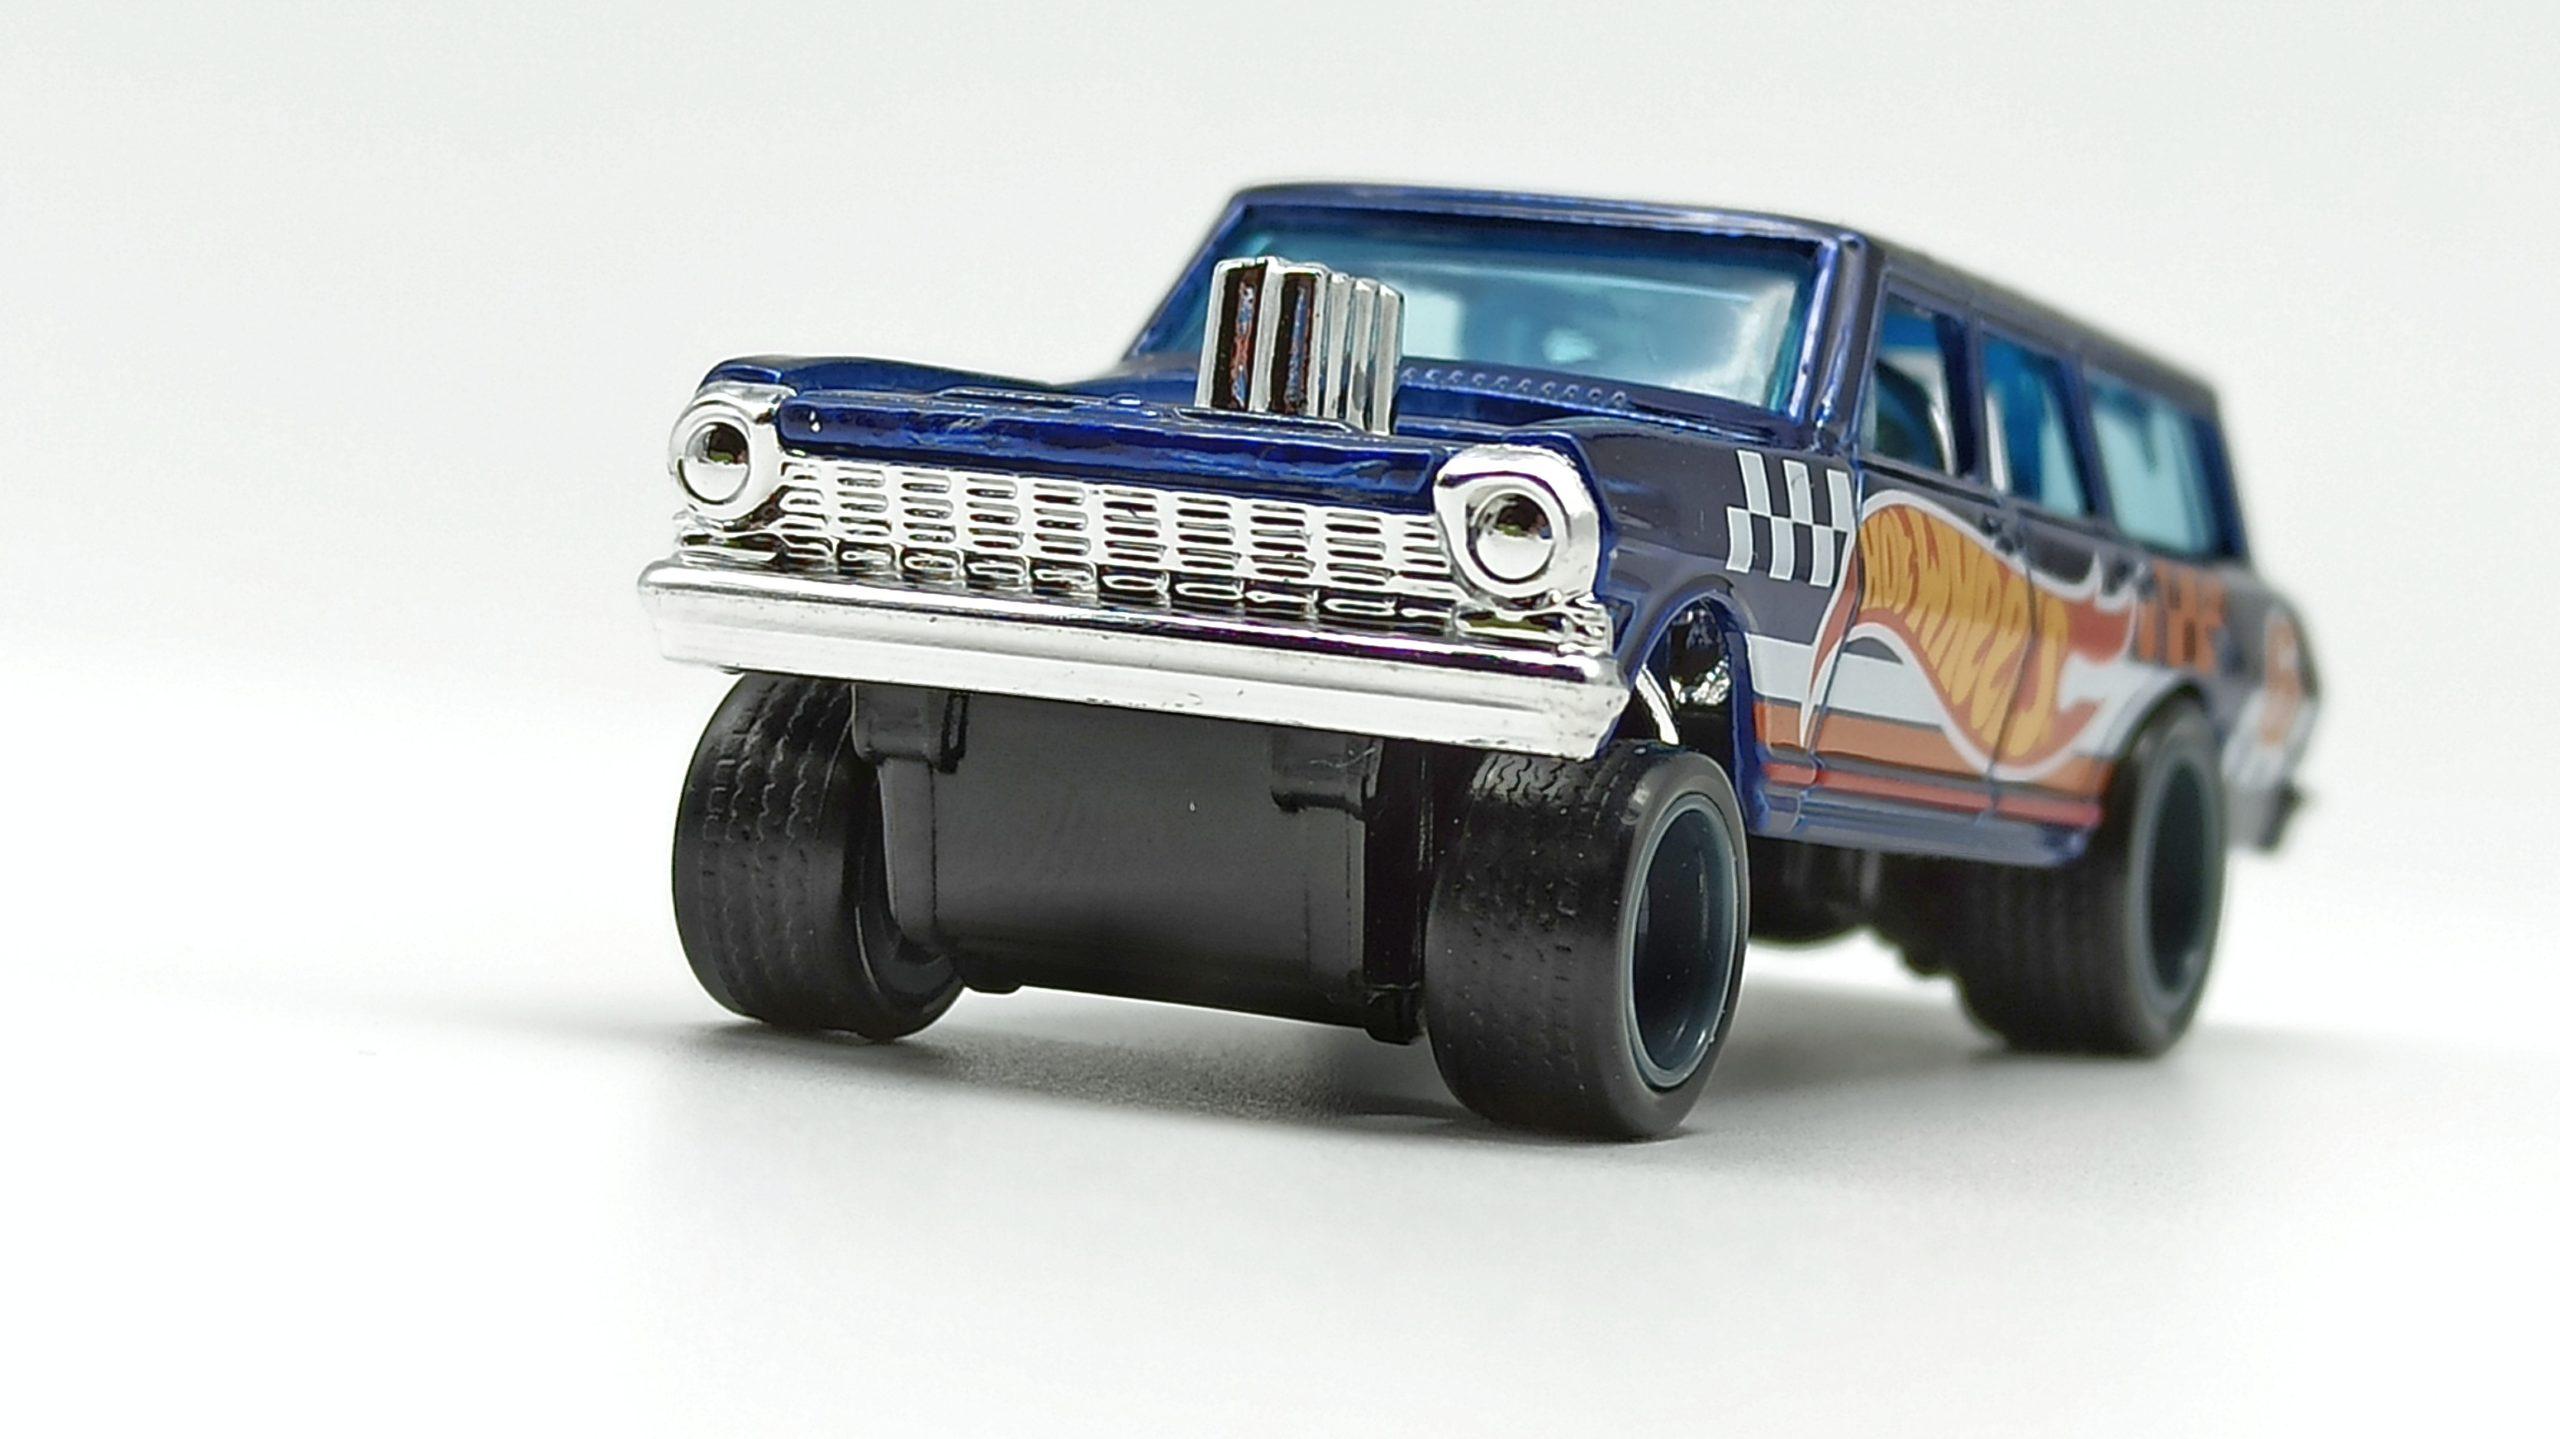 Hot Wheels '64 Chevy Nova Wagon Gasser (GTD06) 2021 (232/250) HW Race Team (7/10) spectraflame blue Super Treasure Hunt (STH) front angle